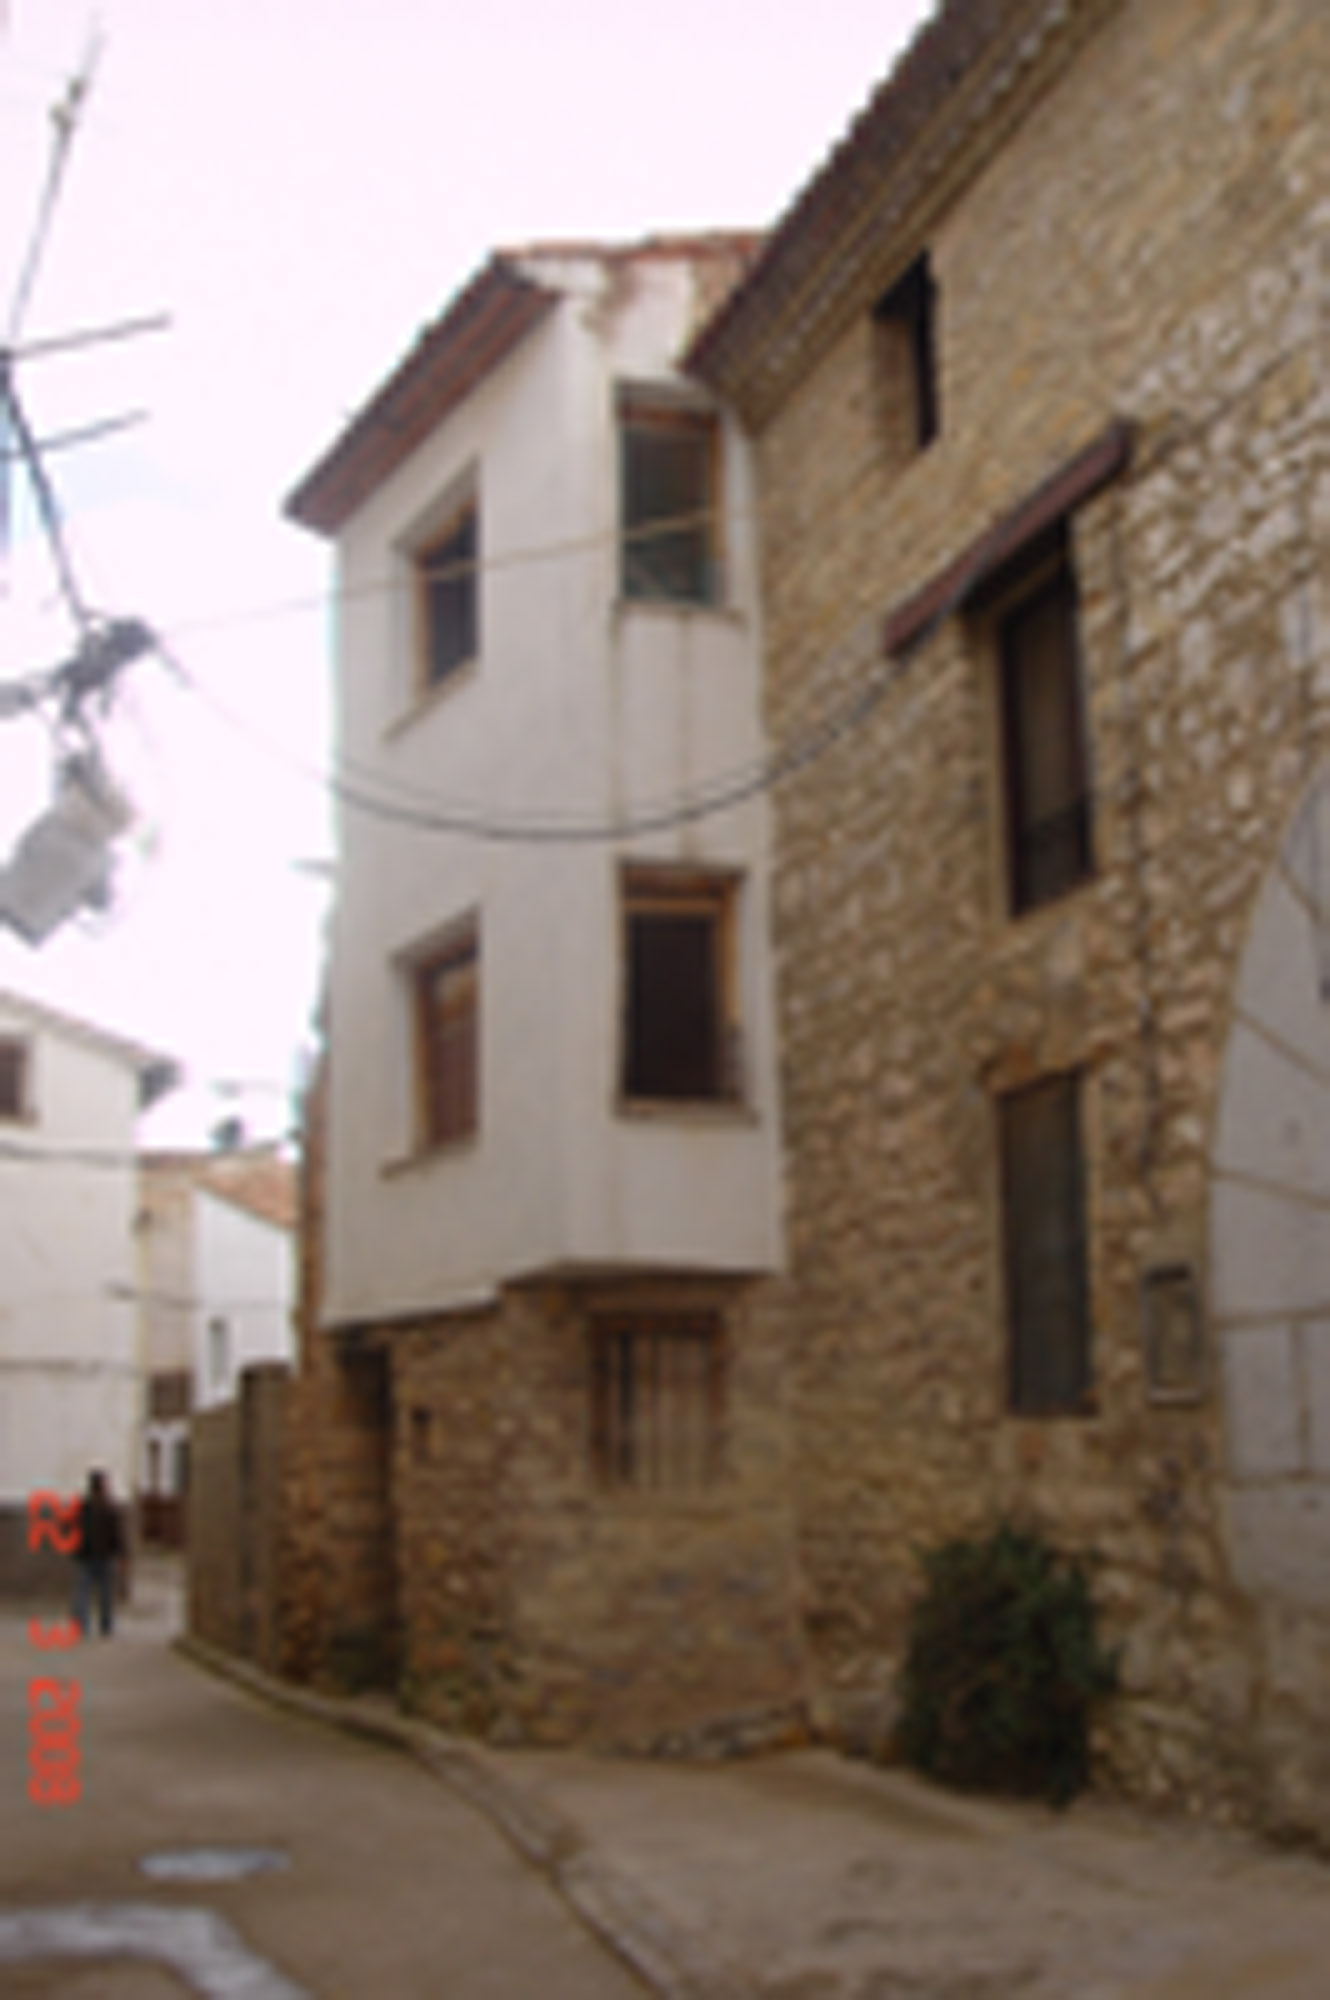 Rehabilitaci N De Casa Rural Ramiro Santiago Darder Arquitecto  ~ Rehabilitacion De Casas Rurales